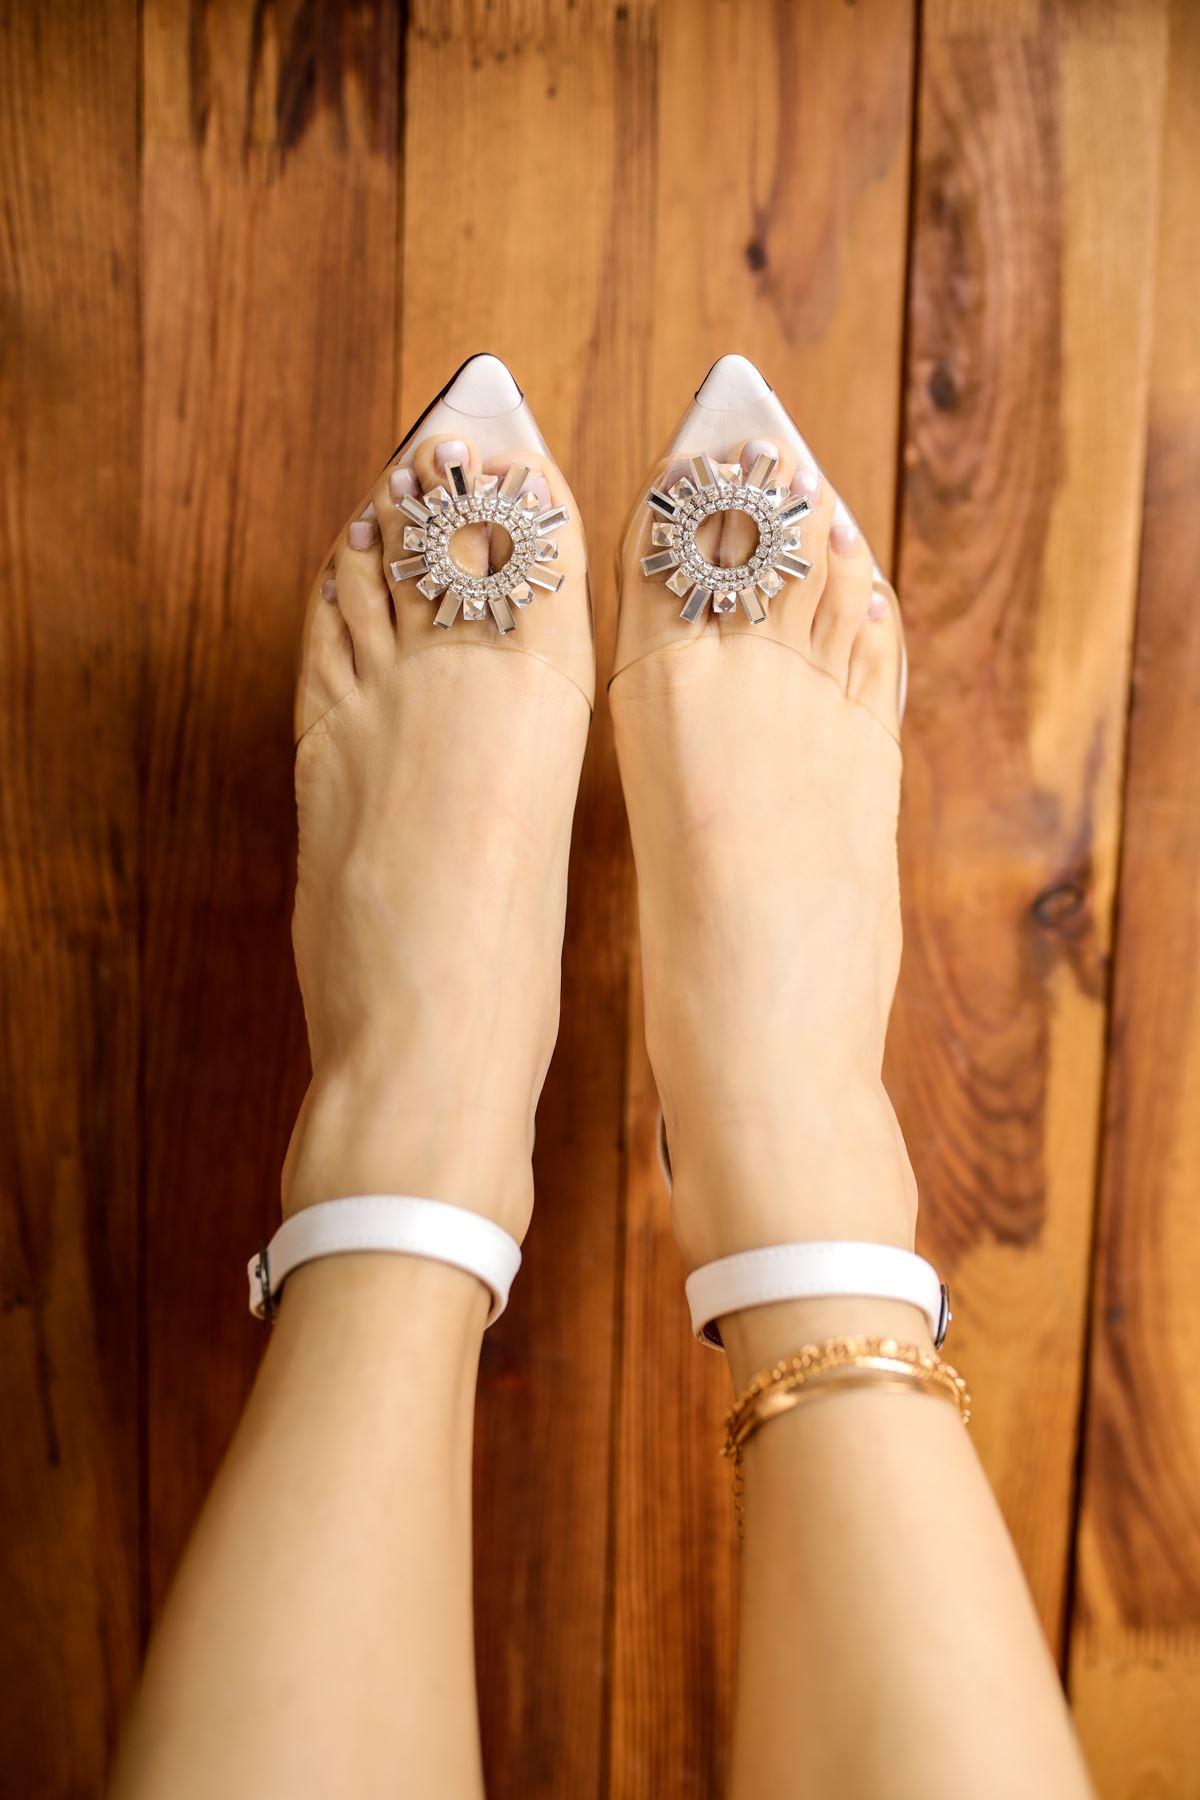 Gino Beyaz Mat Deri Kadın Topuklu Ayakkabı